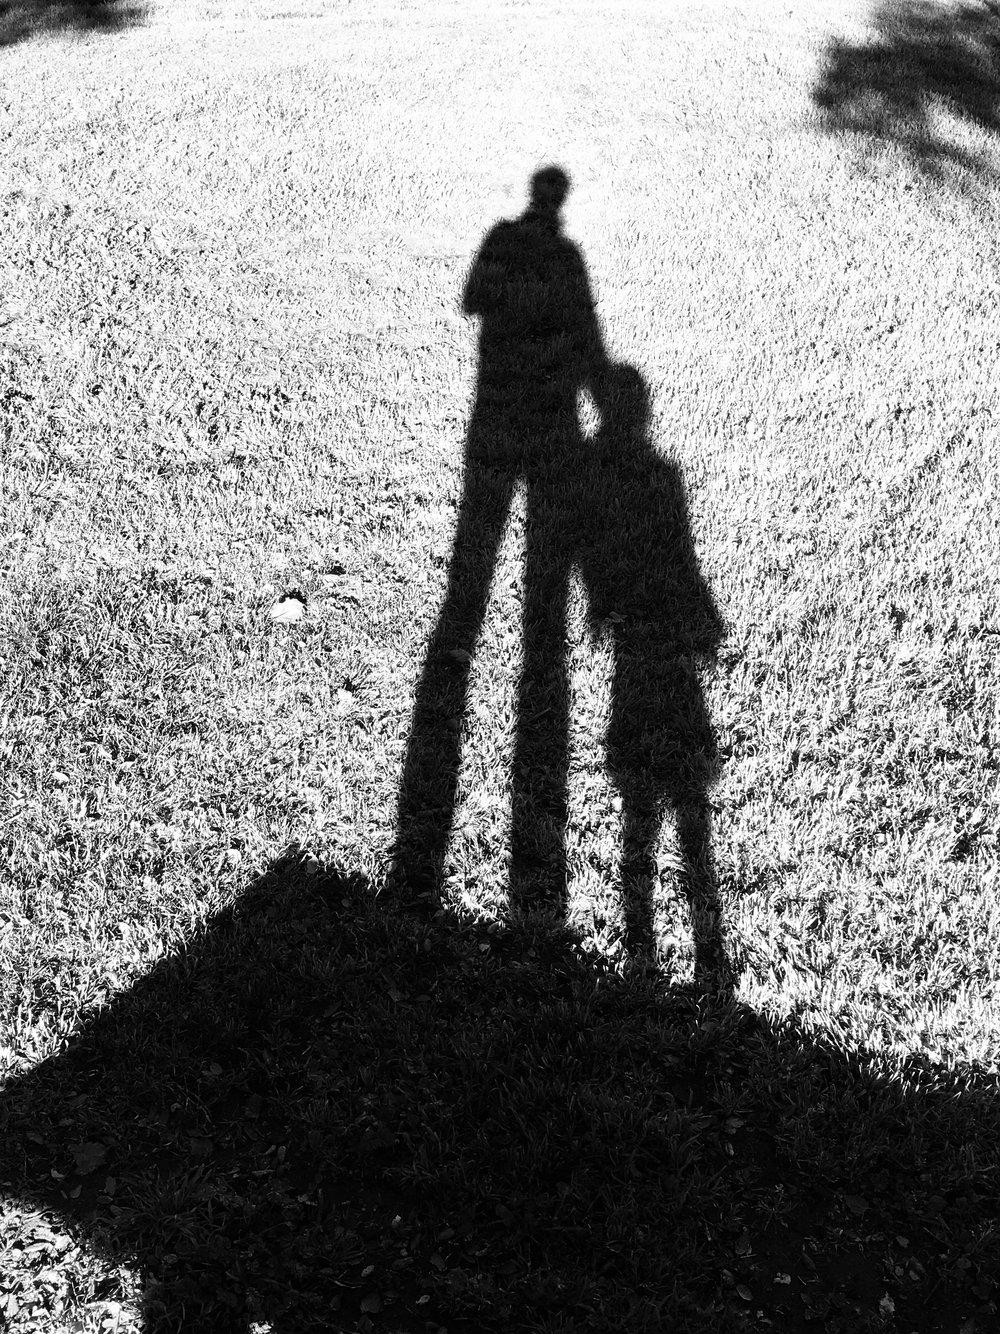 Issa and I